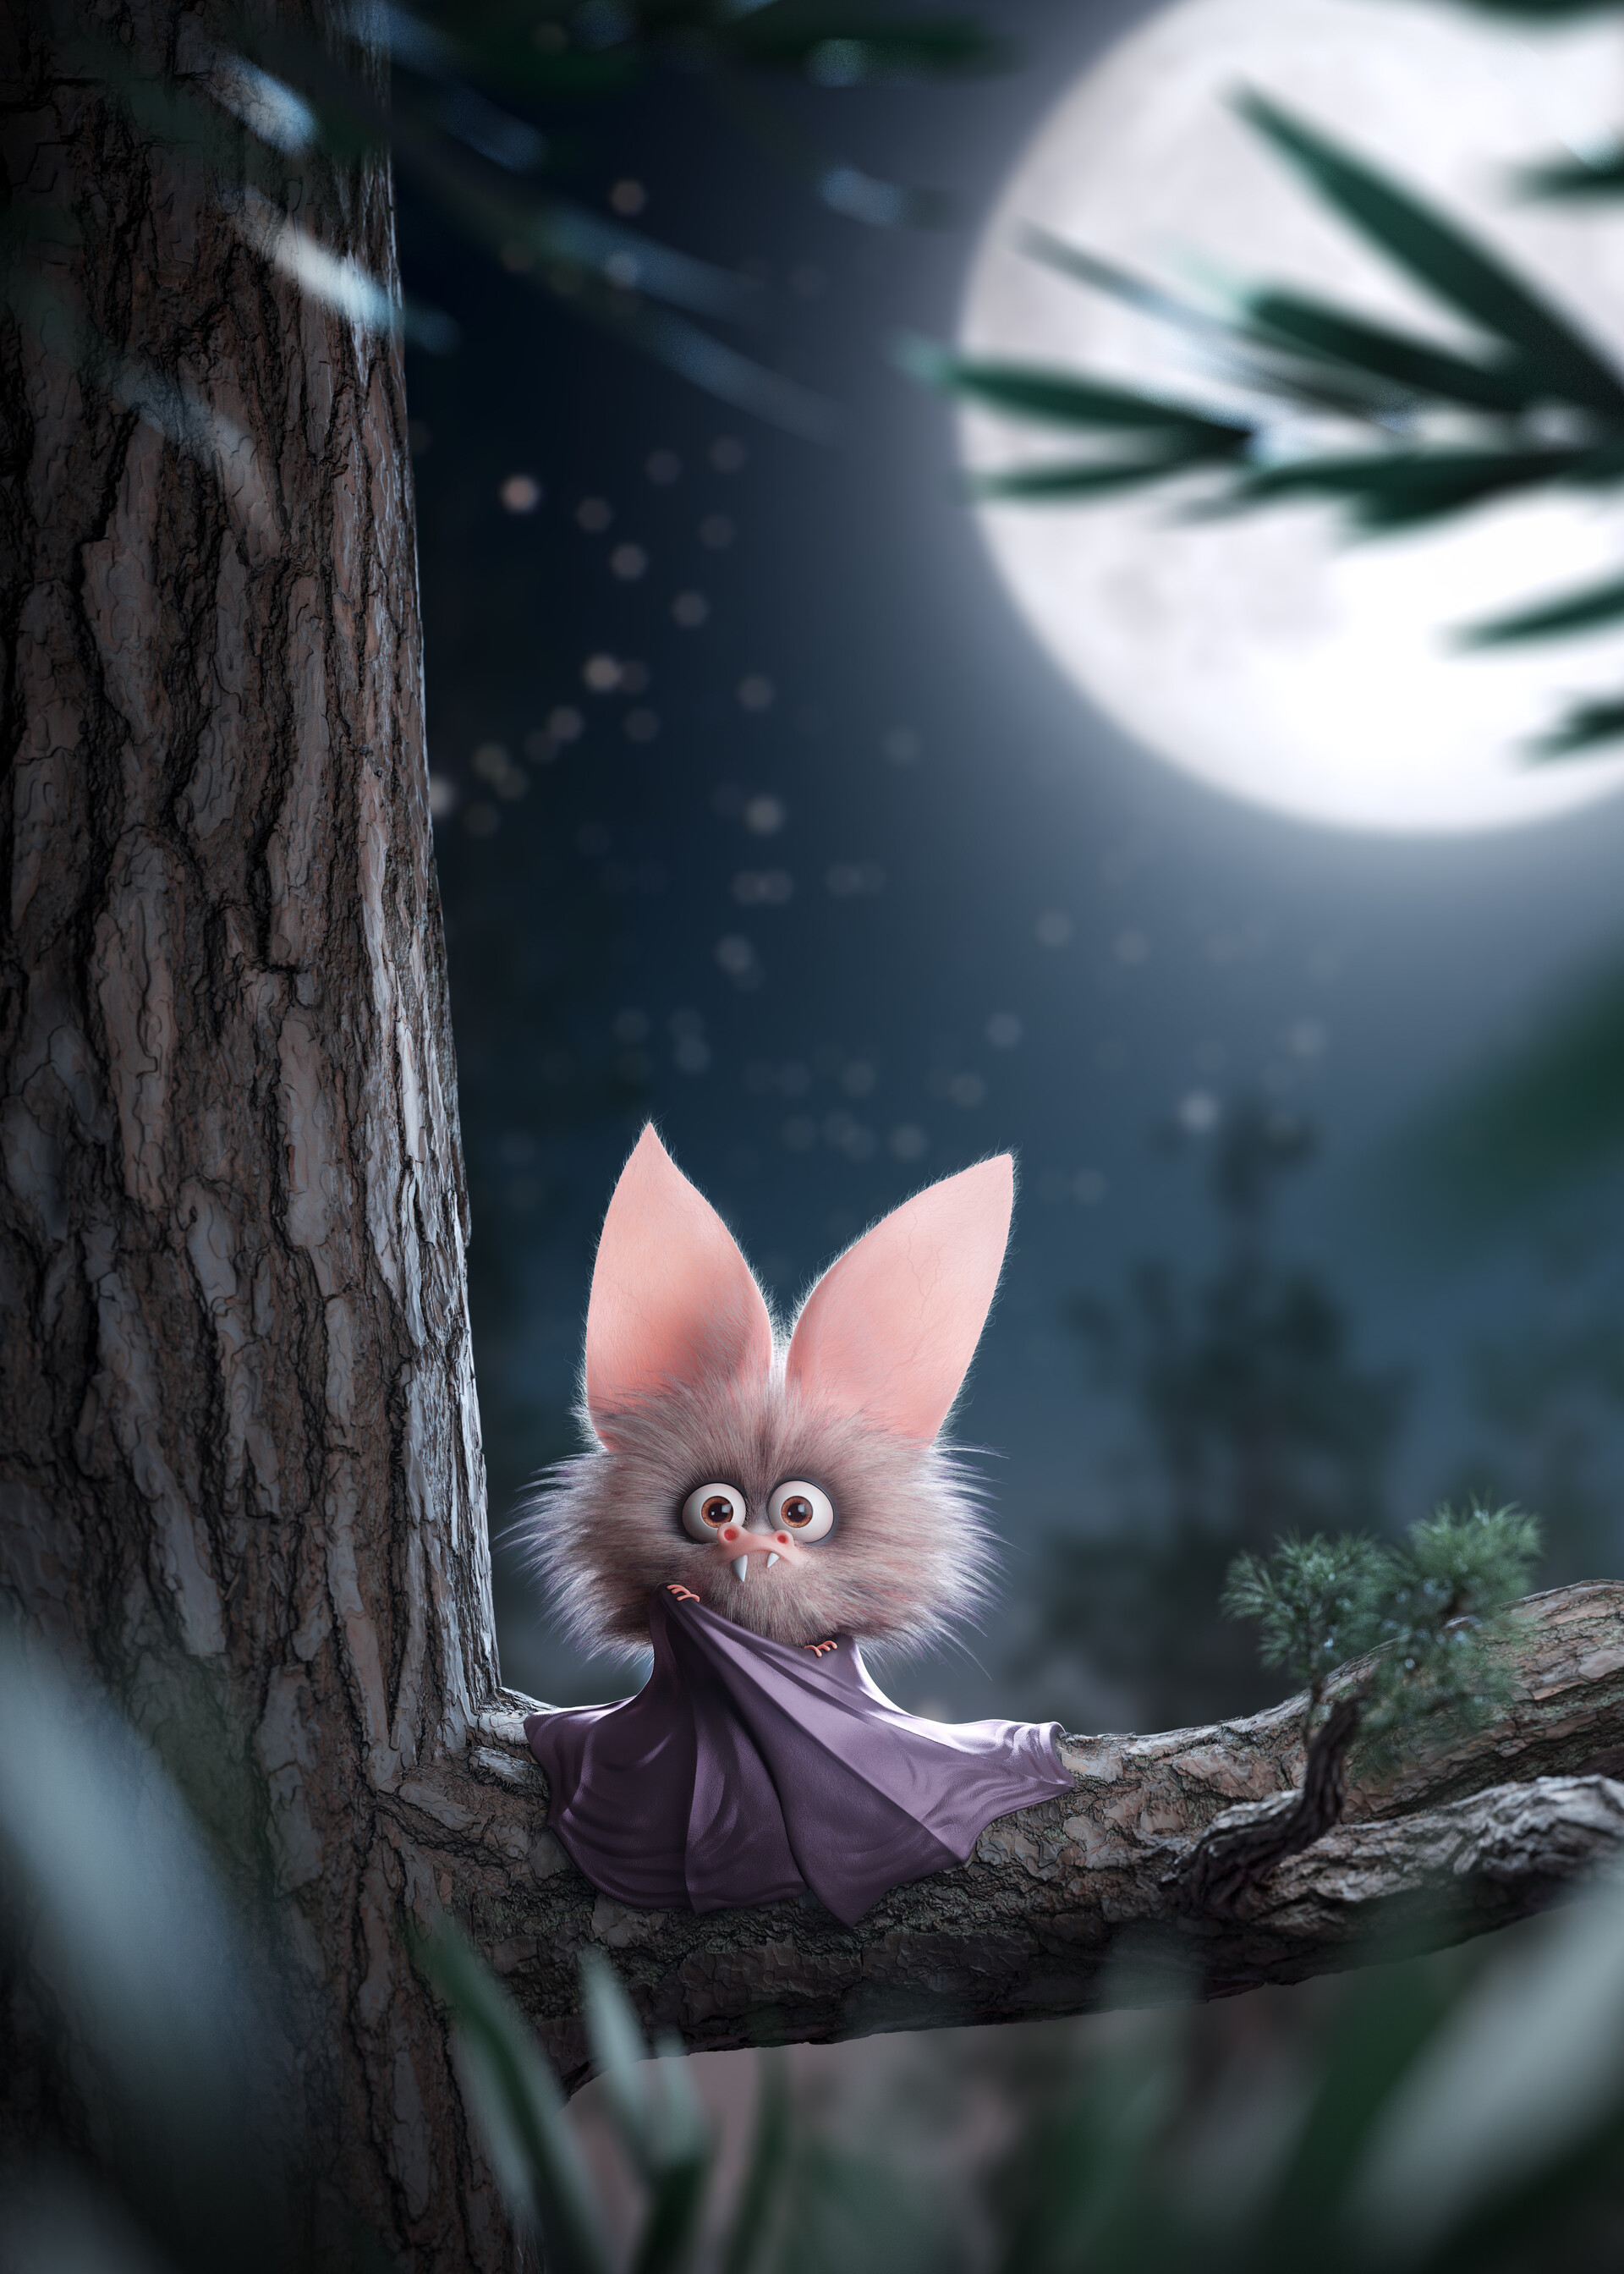 Nights gurdian cartoon 3d cg stylized animal